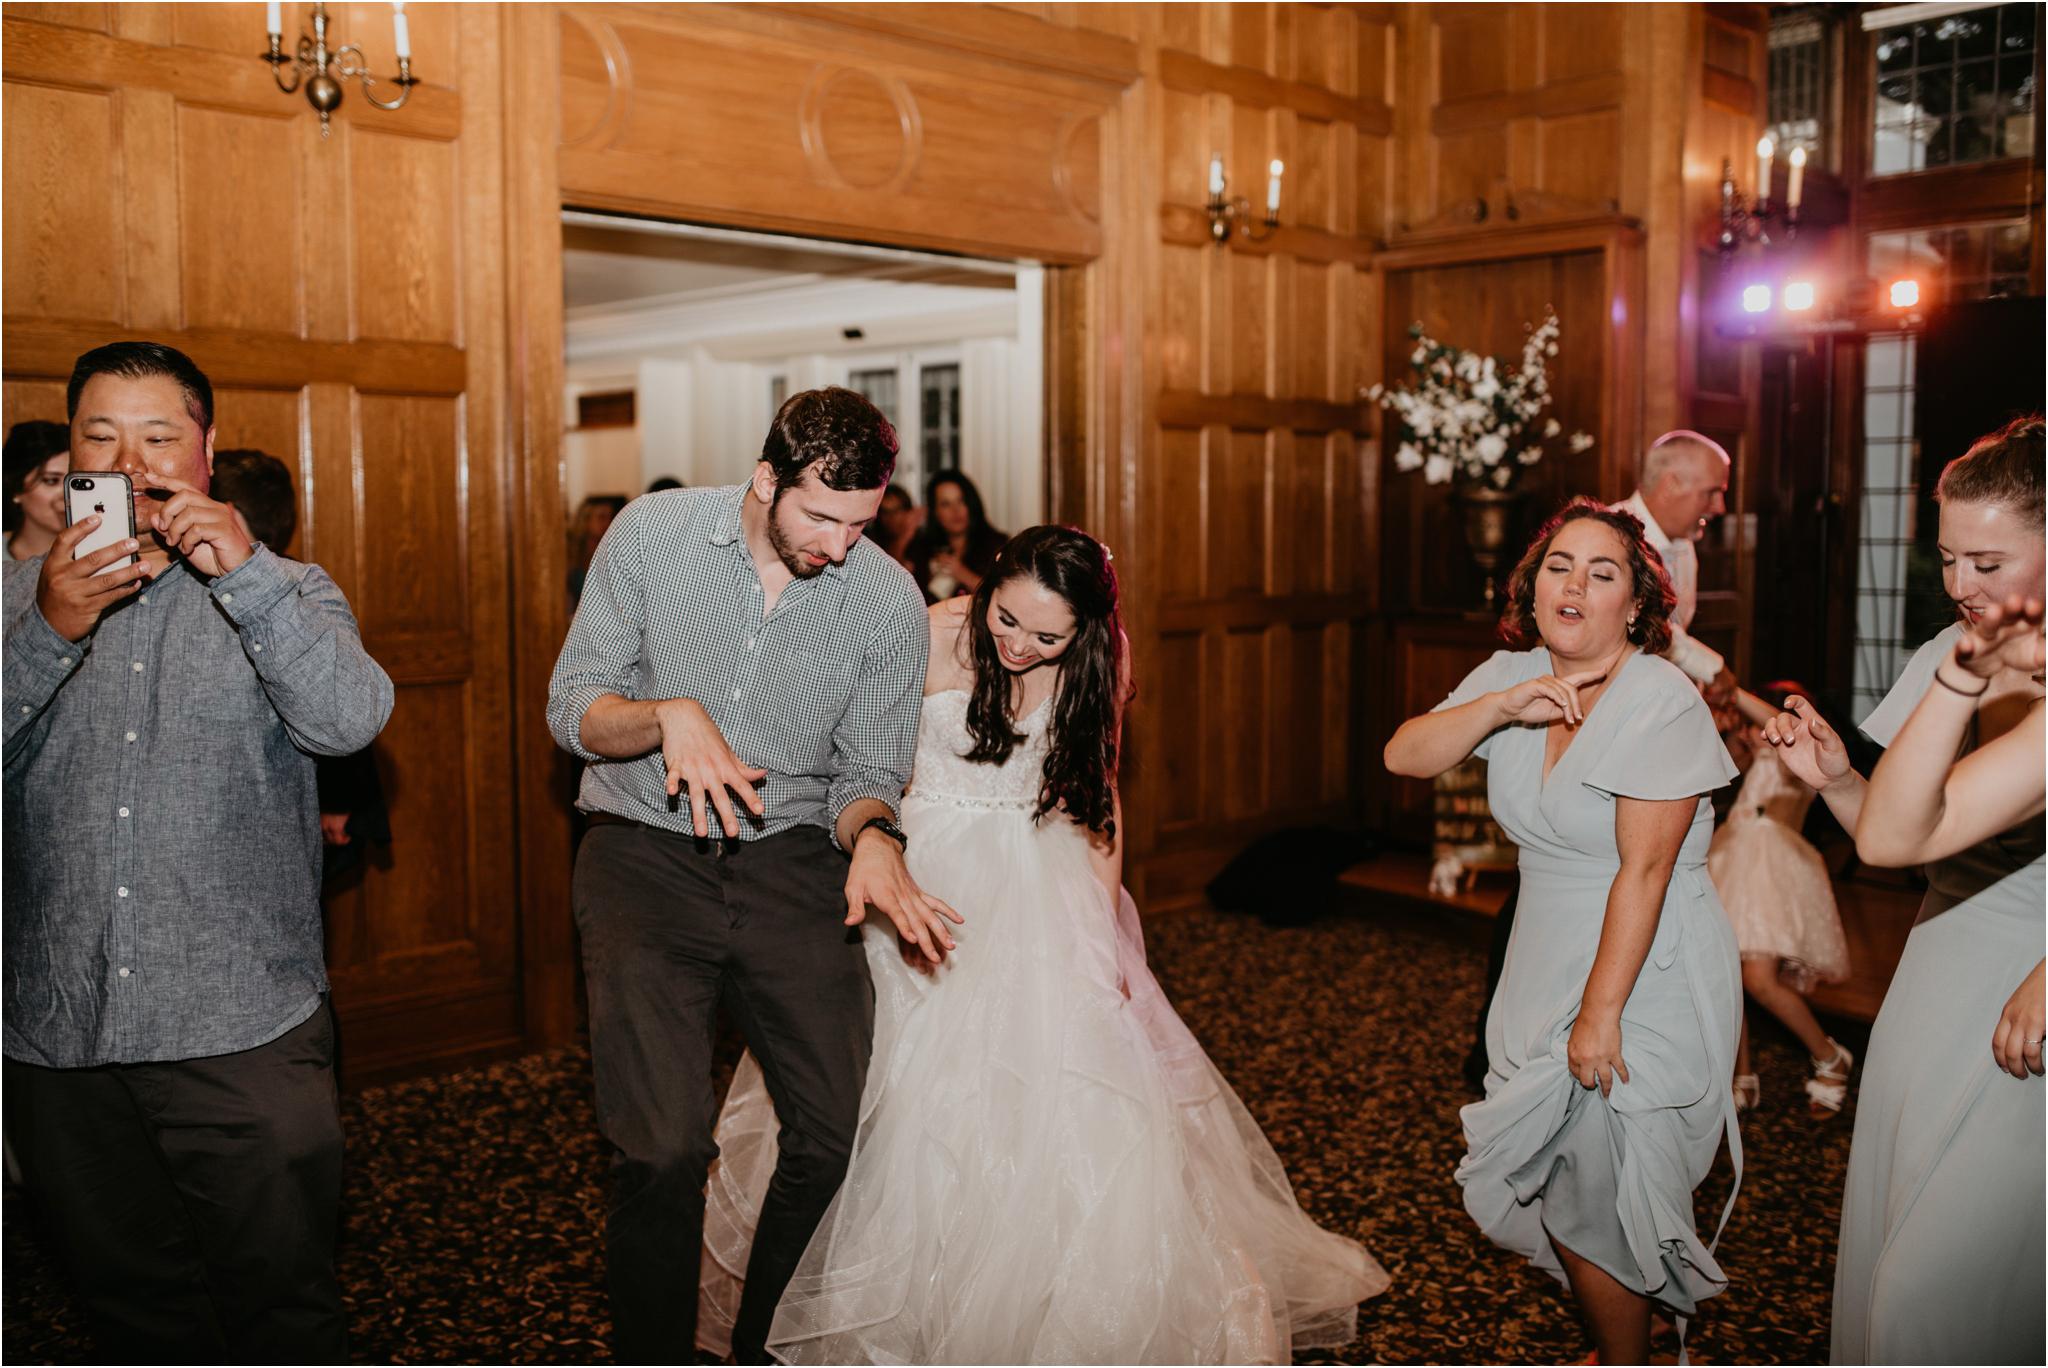 chance-and-ondrea-lairmont-manor-wedding-seattle-photographer-144.jpg